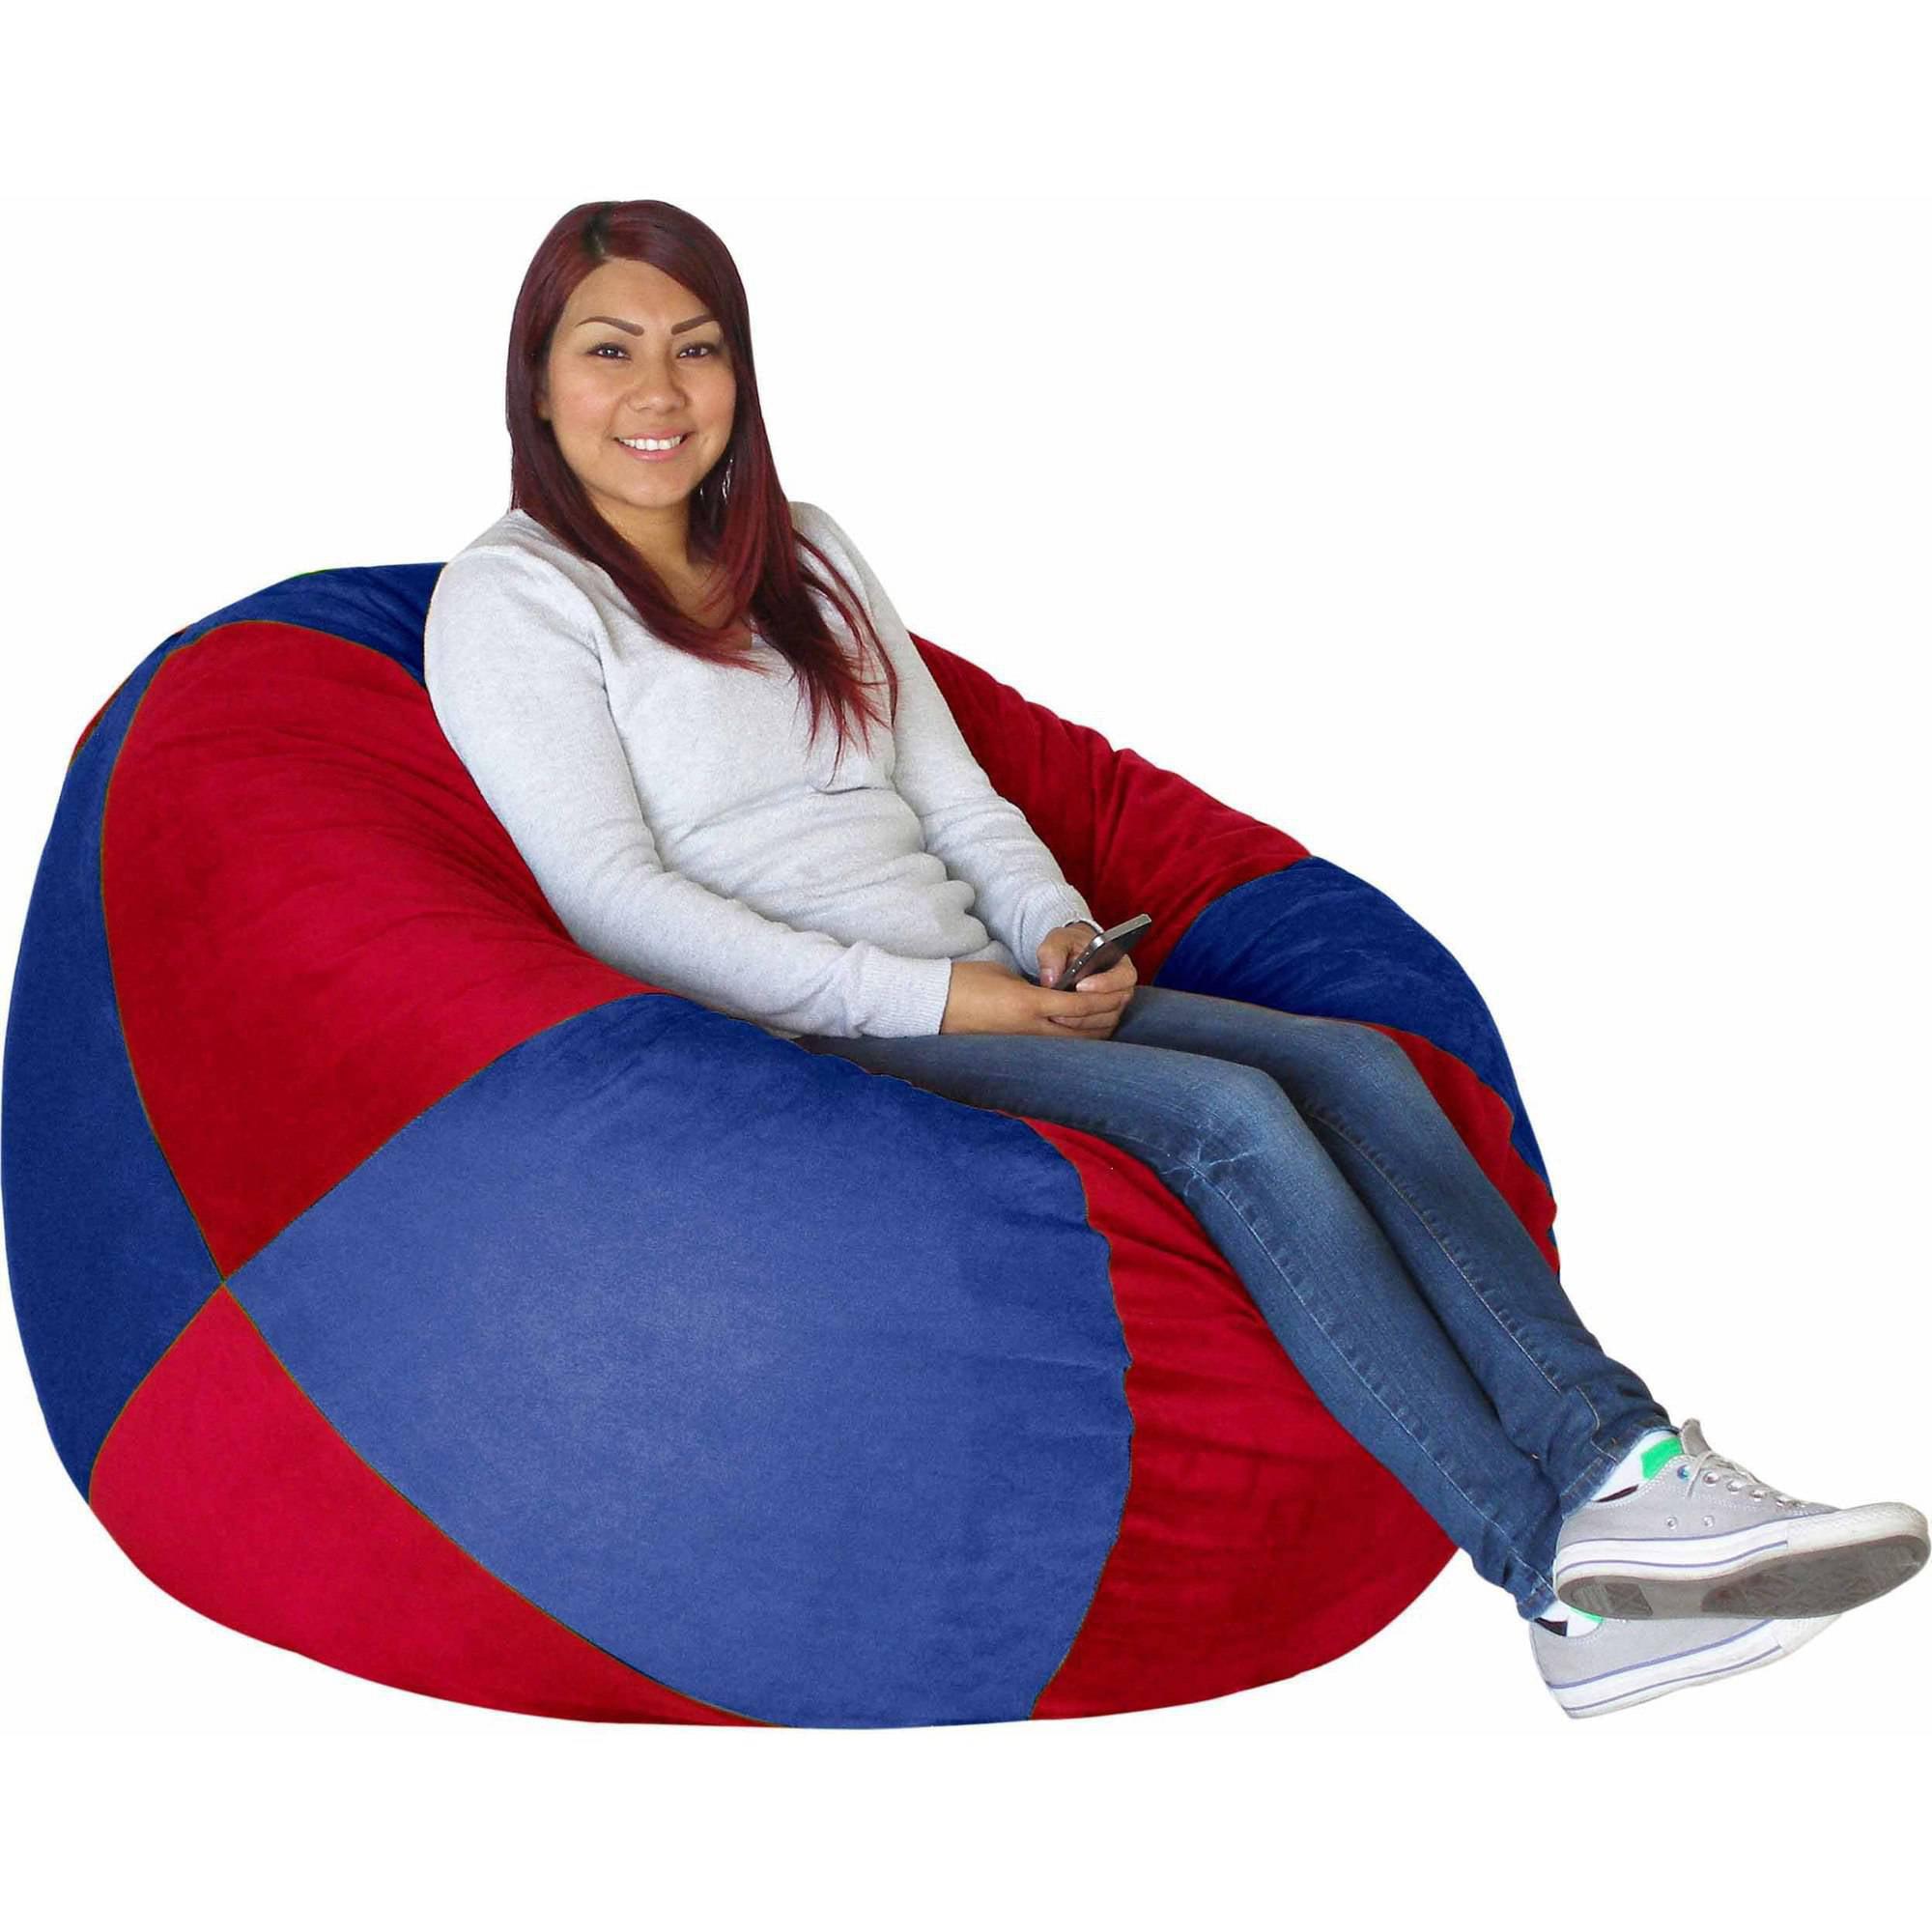 sc 1 st  Walmart & Big Tree Furniture Koala Foam Bean Bag Chair - Walmart.com